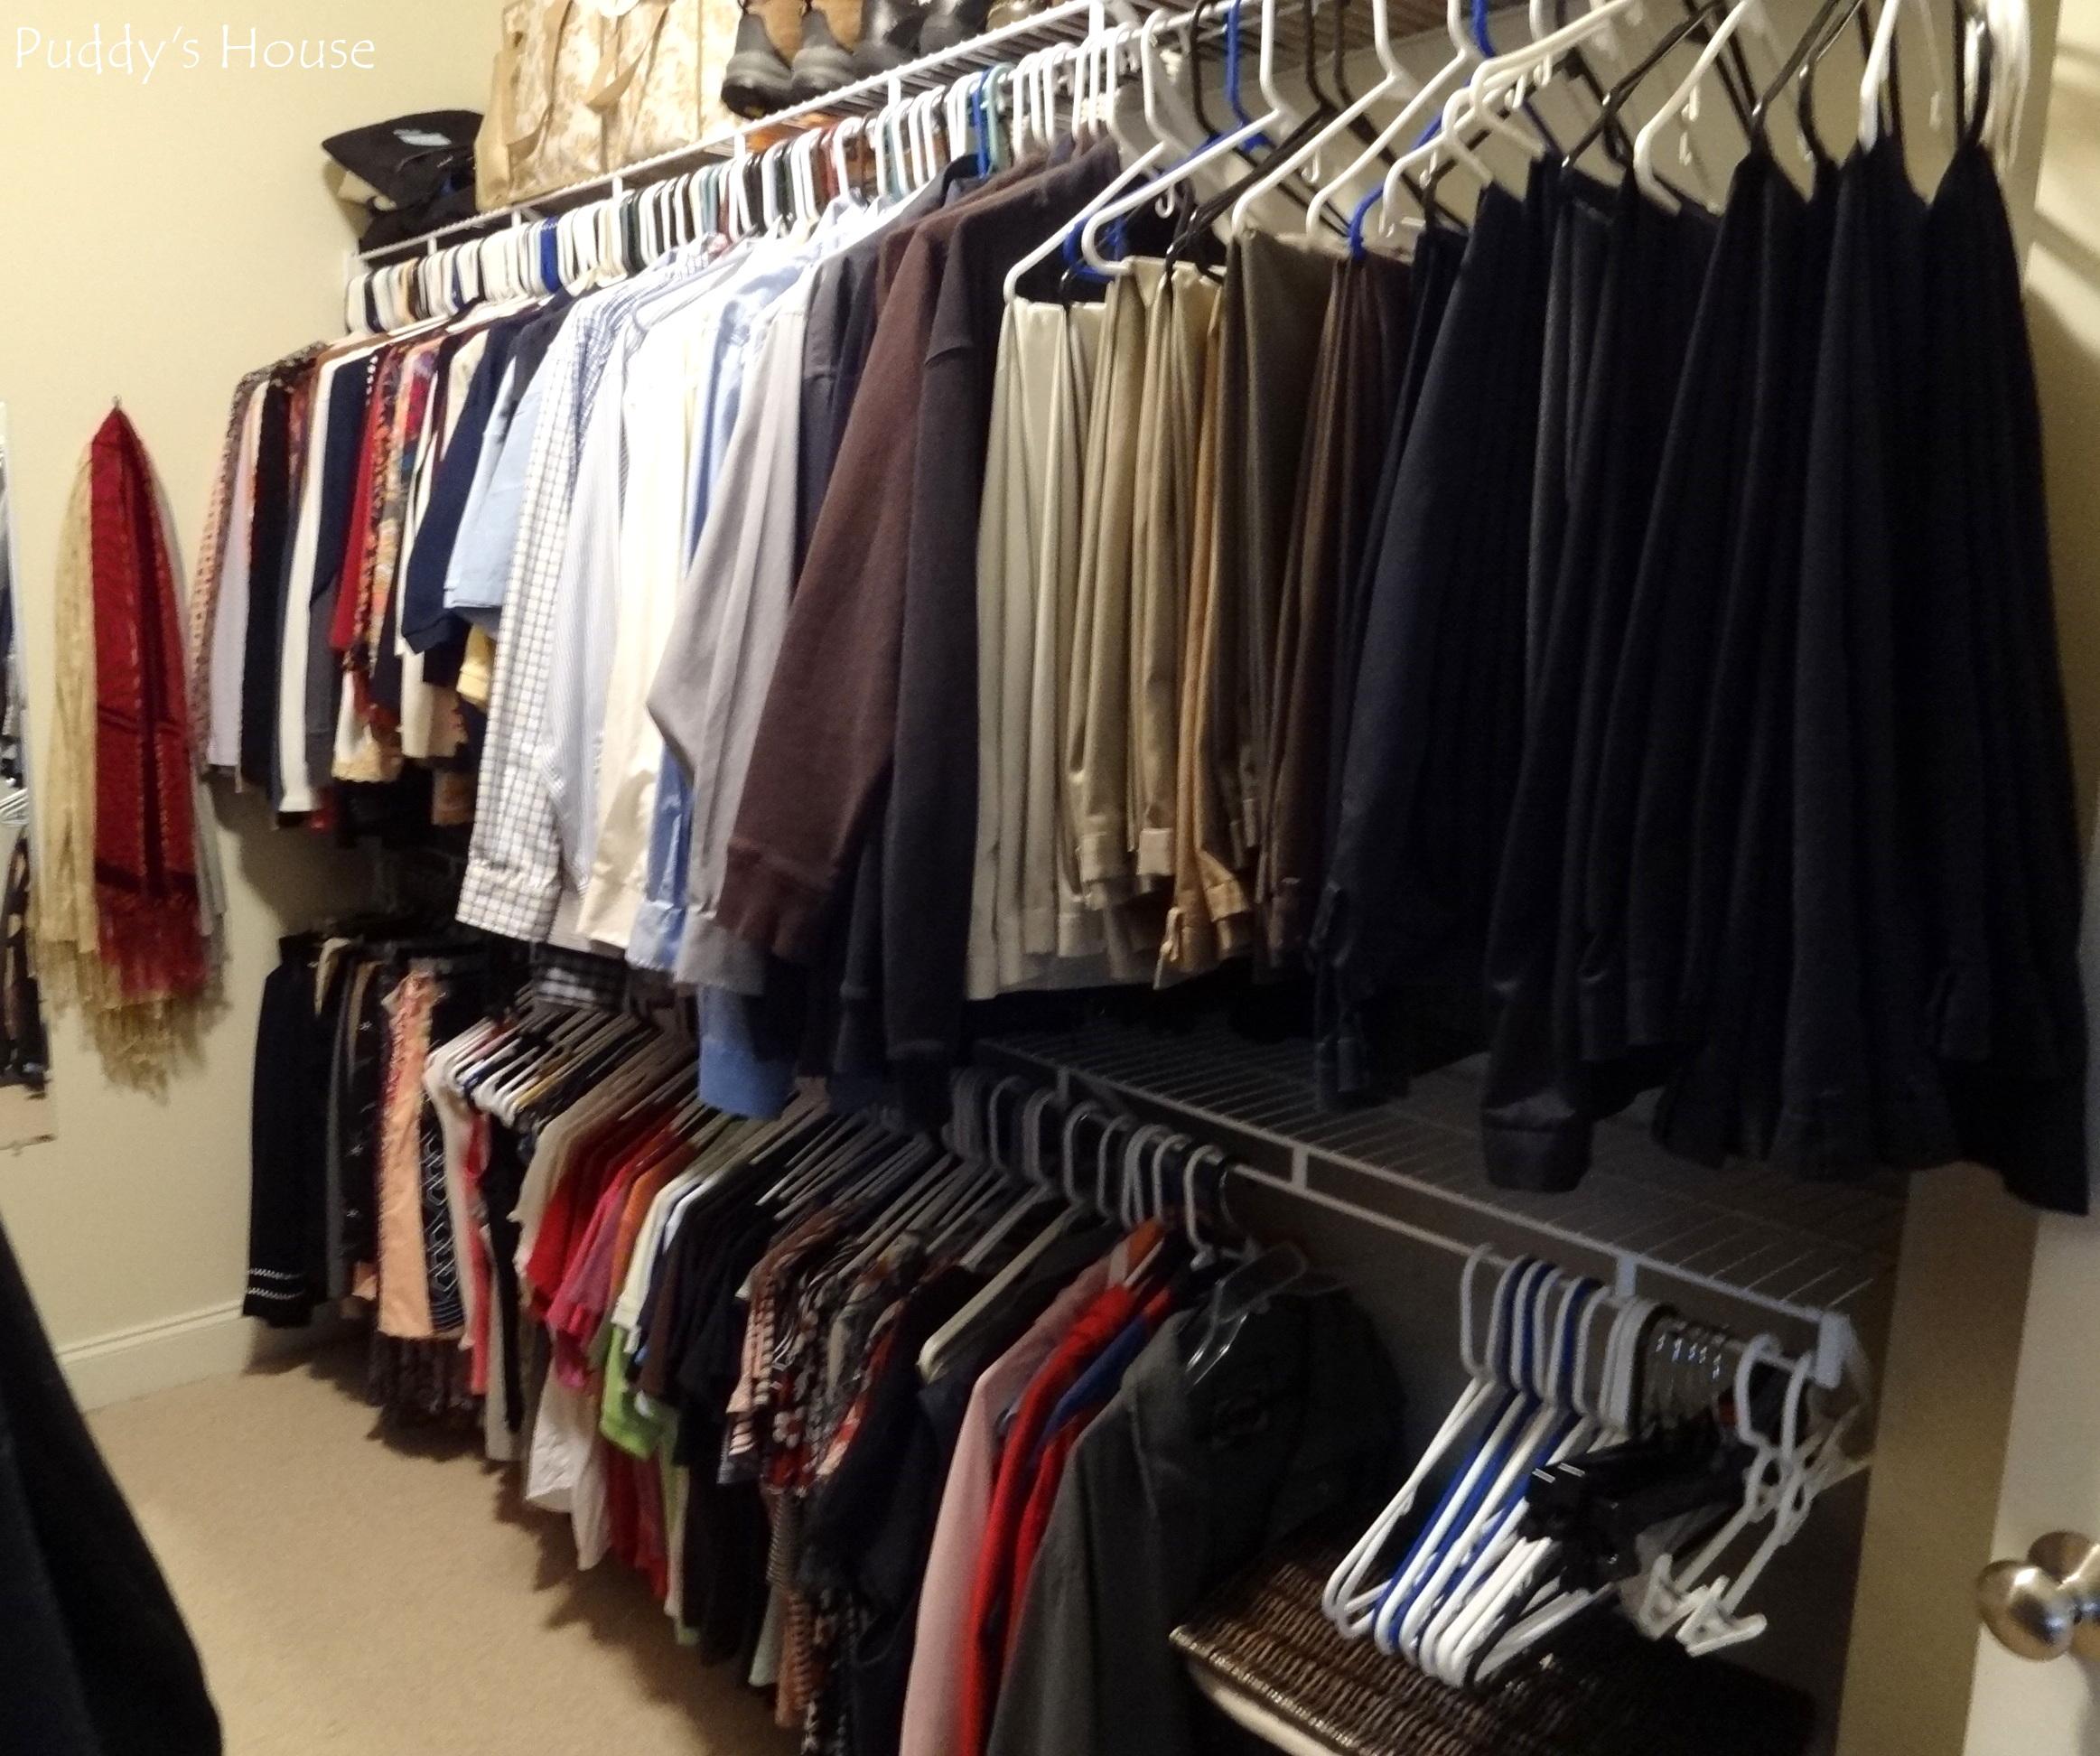 Superb Closet Reorganization   Closet Right Side After